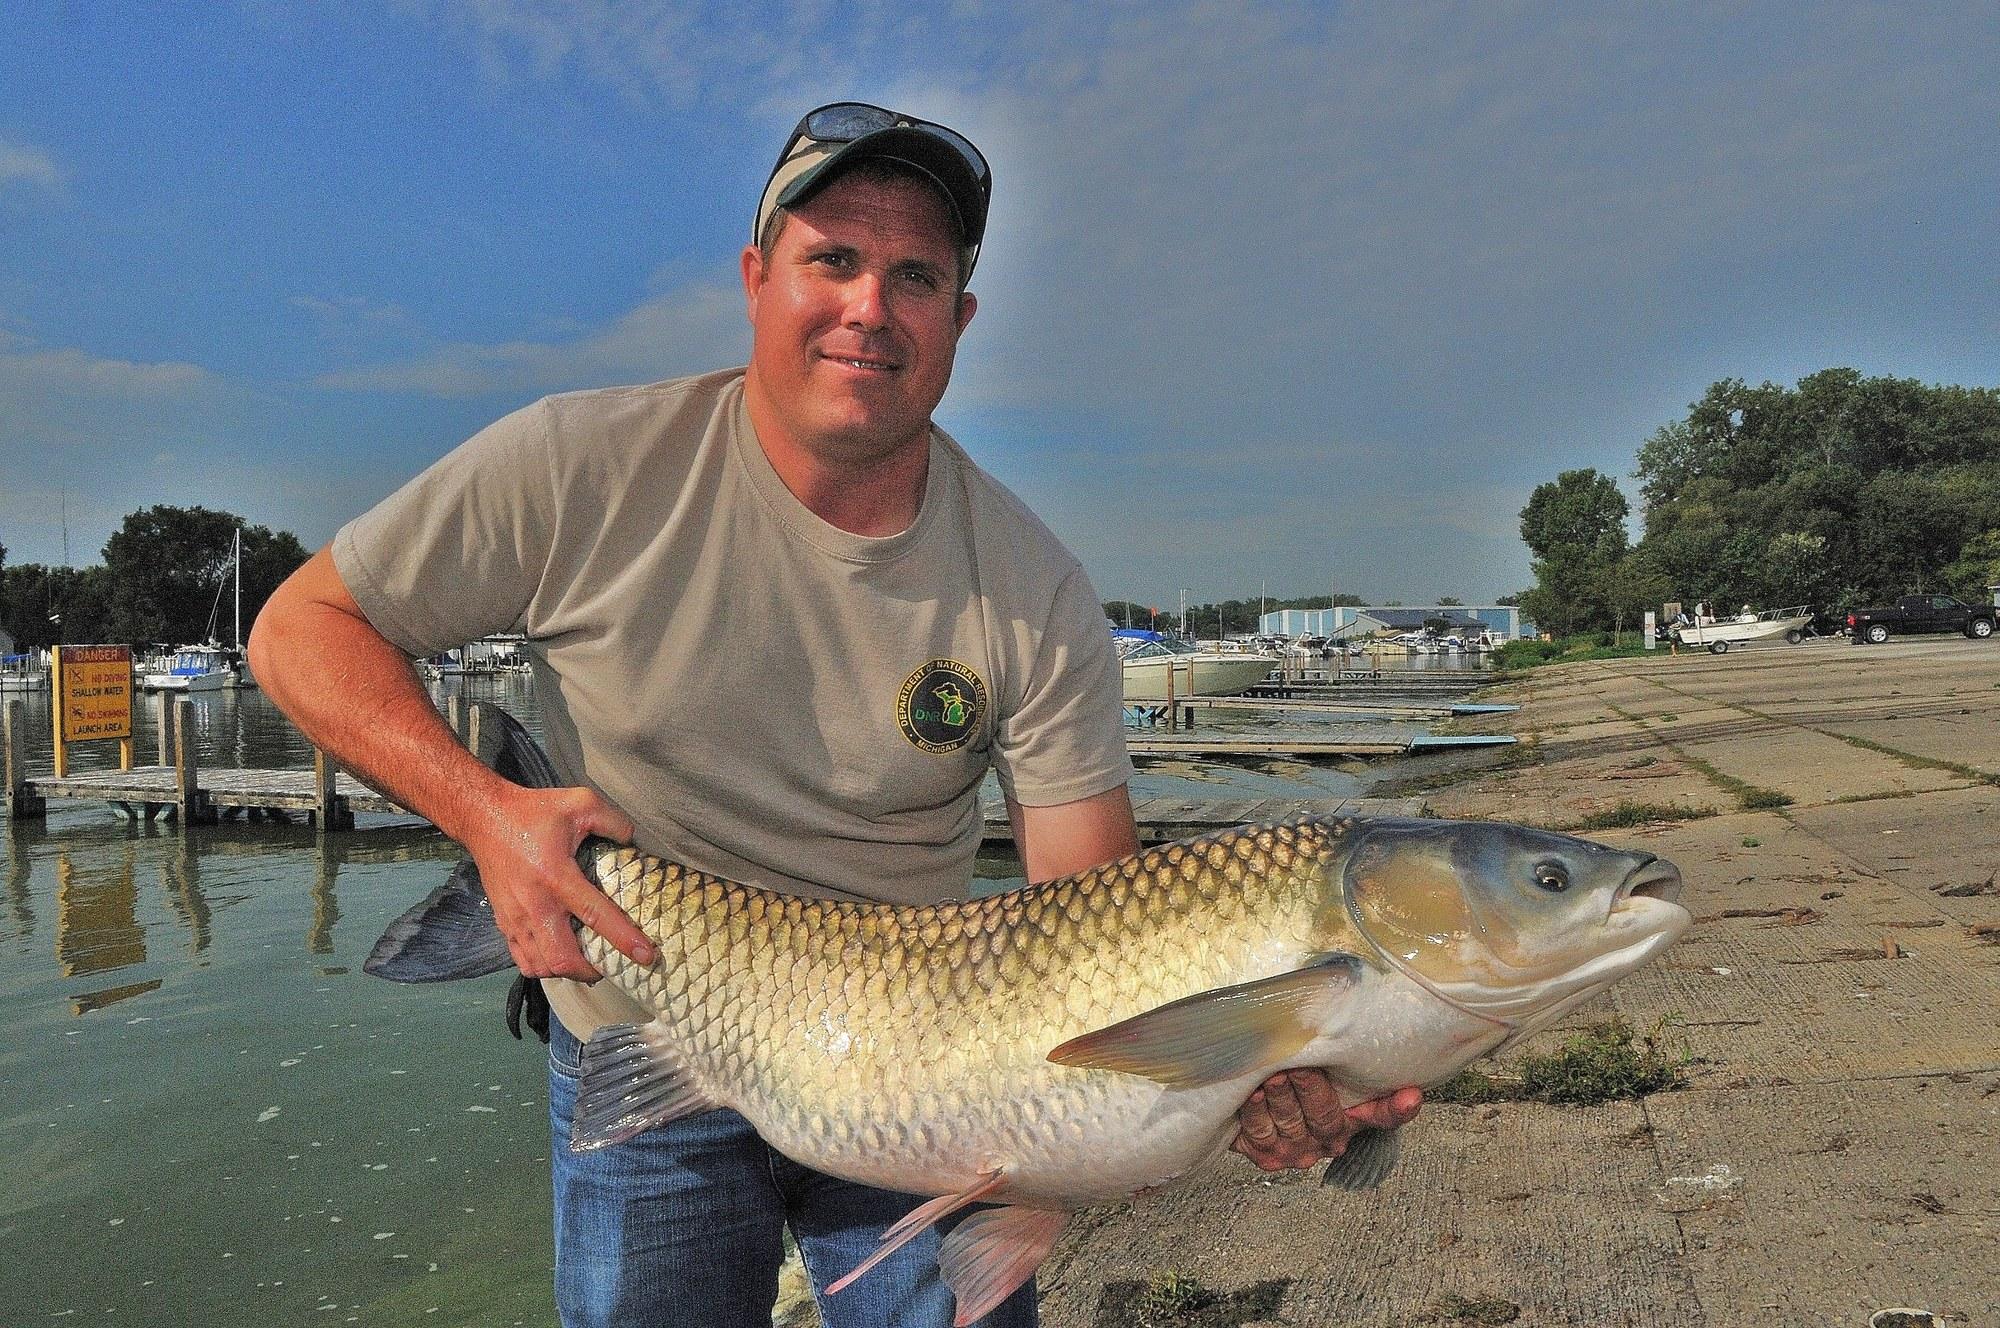 Michigan Department of Natural Resources fisheries biologist Cleyo Harris displays a Lake Erie grass carp.